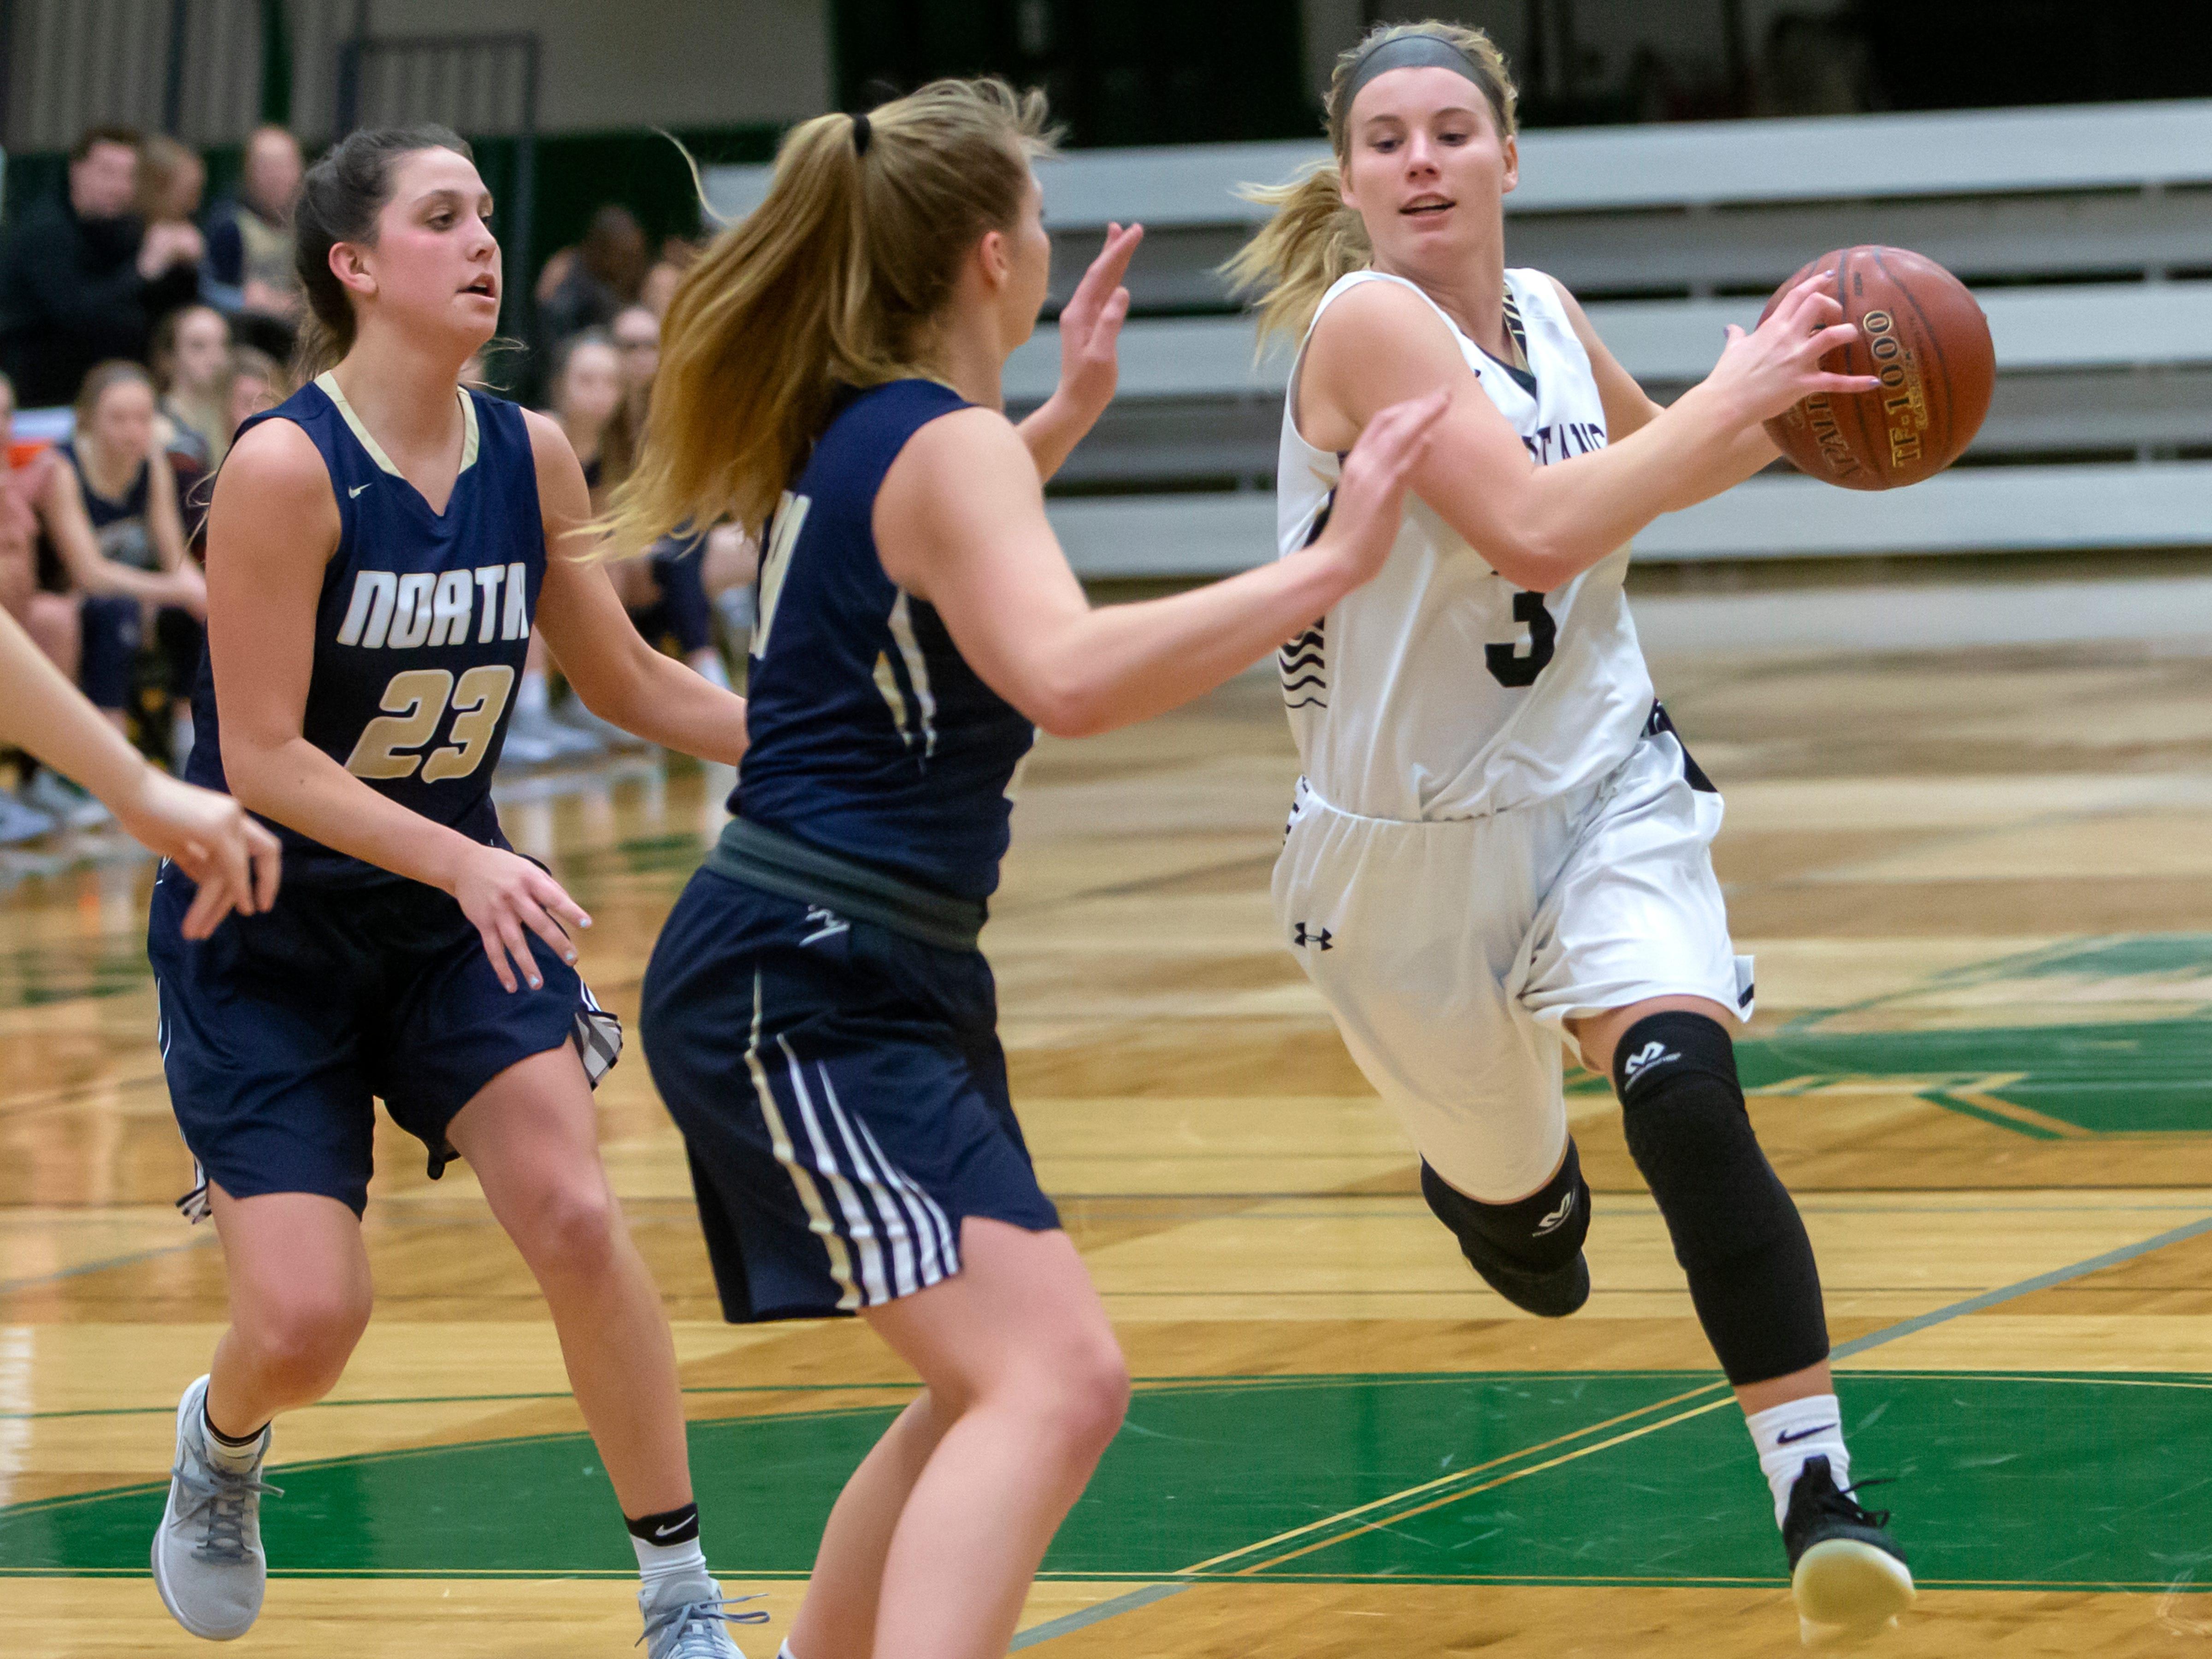 Oshkosh North's Ashley Wissink charges toward the basket around Appleton North's Paige Schabo at the girls basketball game Friday, February 8, 2019, in Oshkosh, Wis., at Oshkosh North High School.